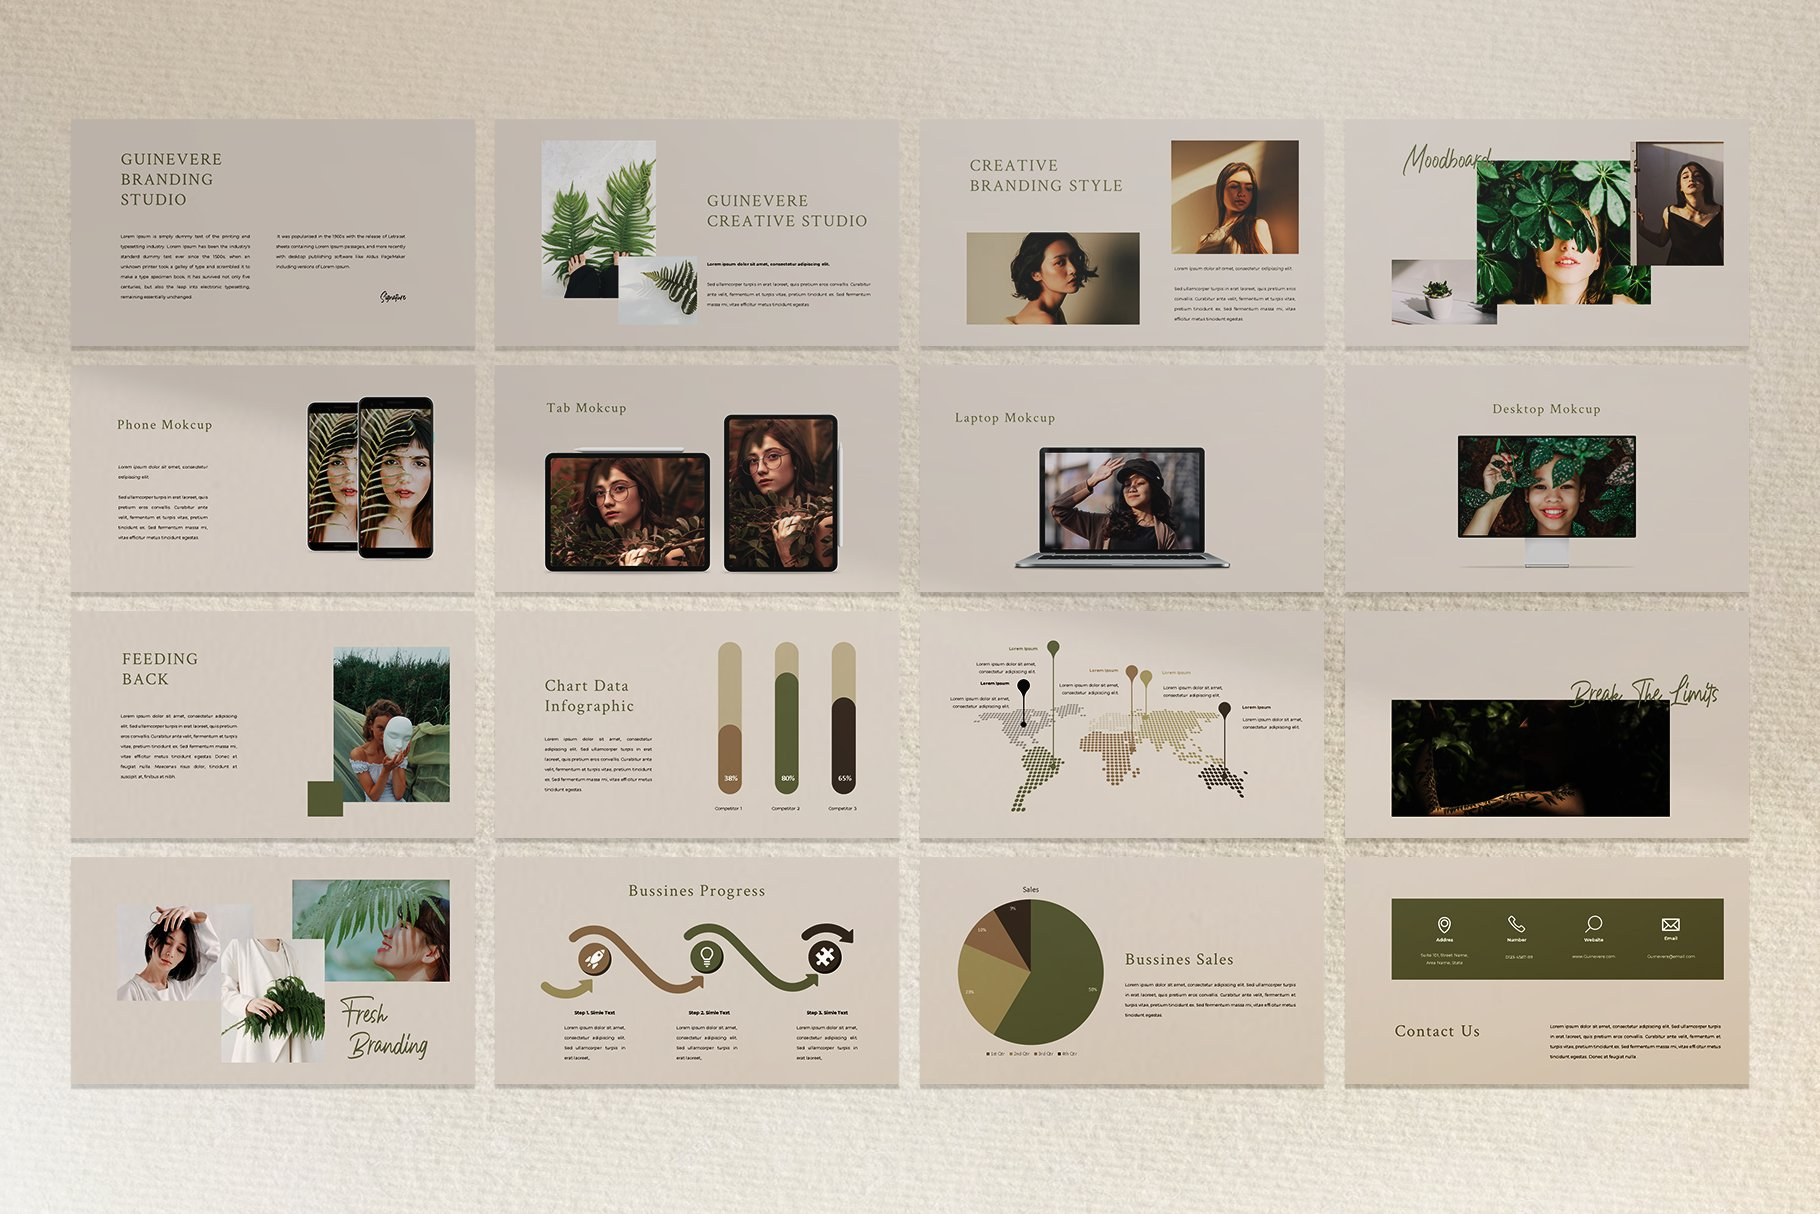 时尚品牌摄影作品集营销PPT幻灯片设计模板 Guinevere Presentation Template插图(5)